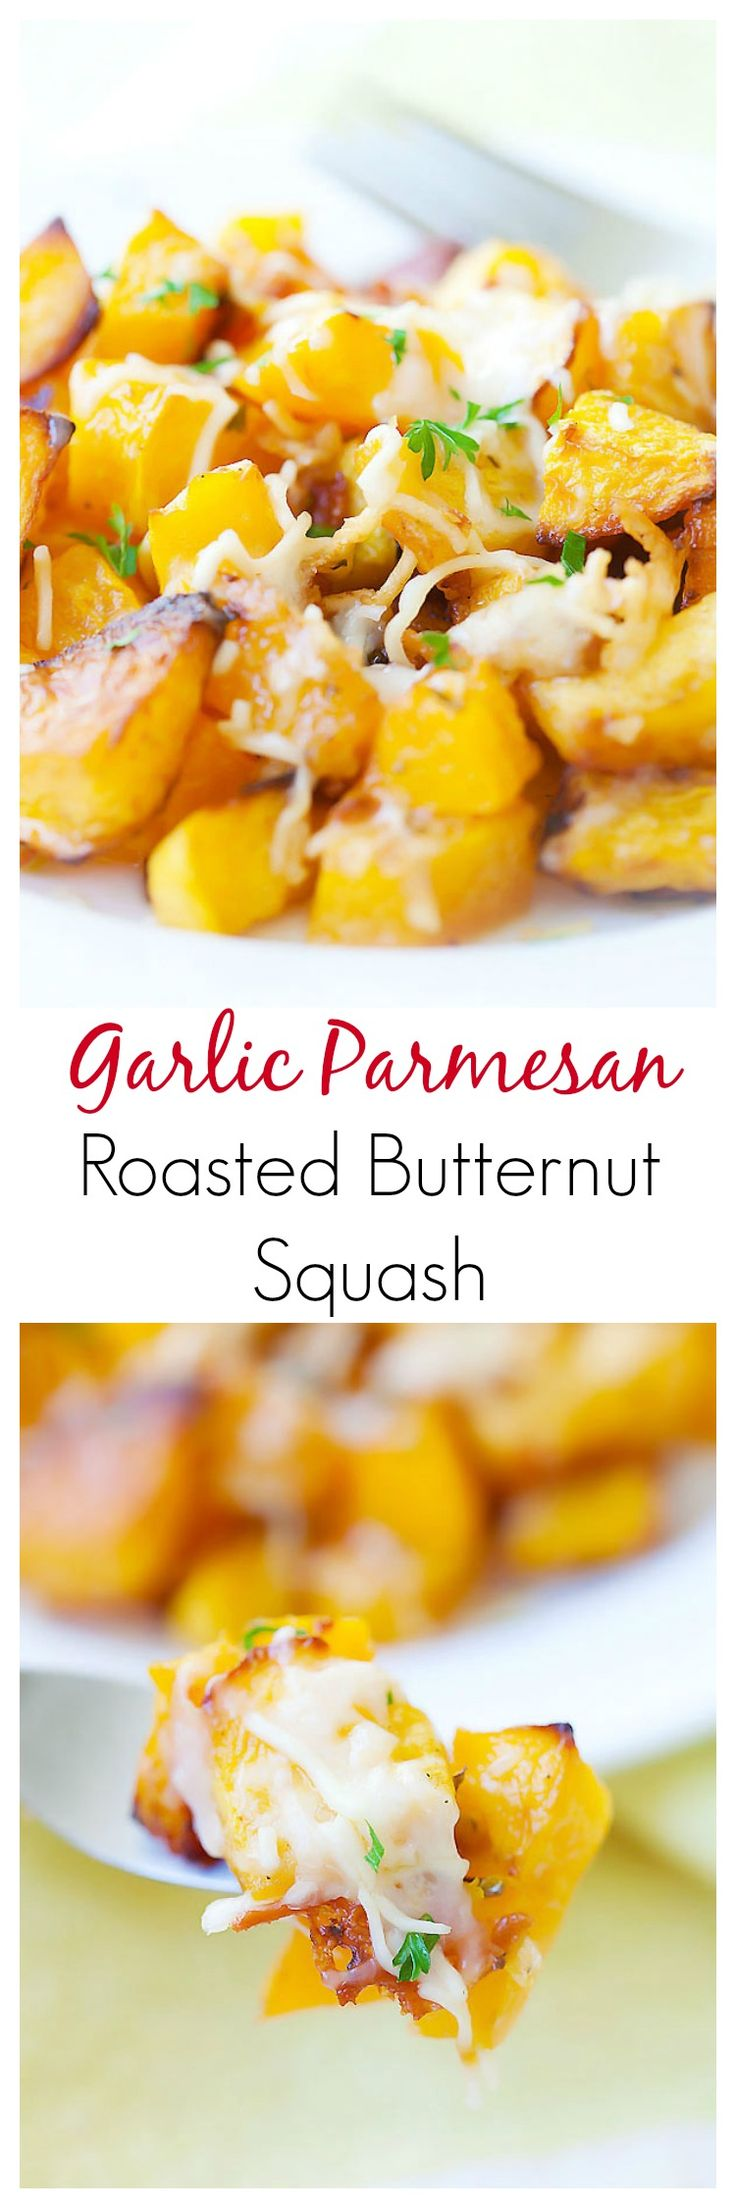 Garlic Parmesan Roasted Butternut squash – sweet tender butternut squash roasted with butter, garlic & Parmesan cheese. So AMAZING you want it every day | rasamalaysia.com